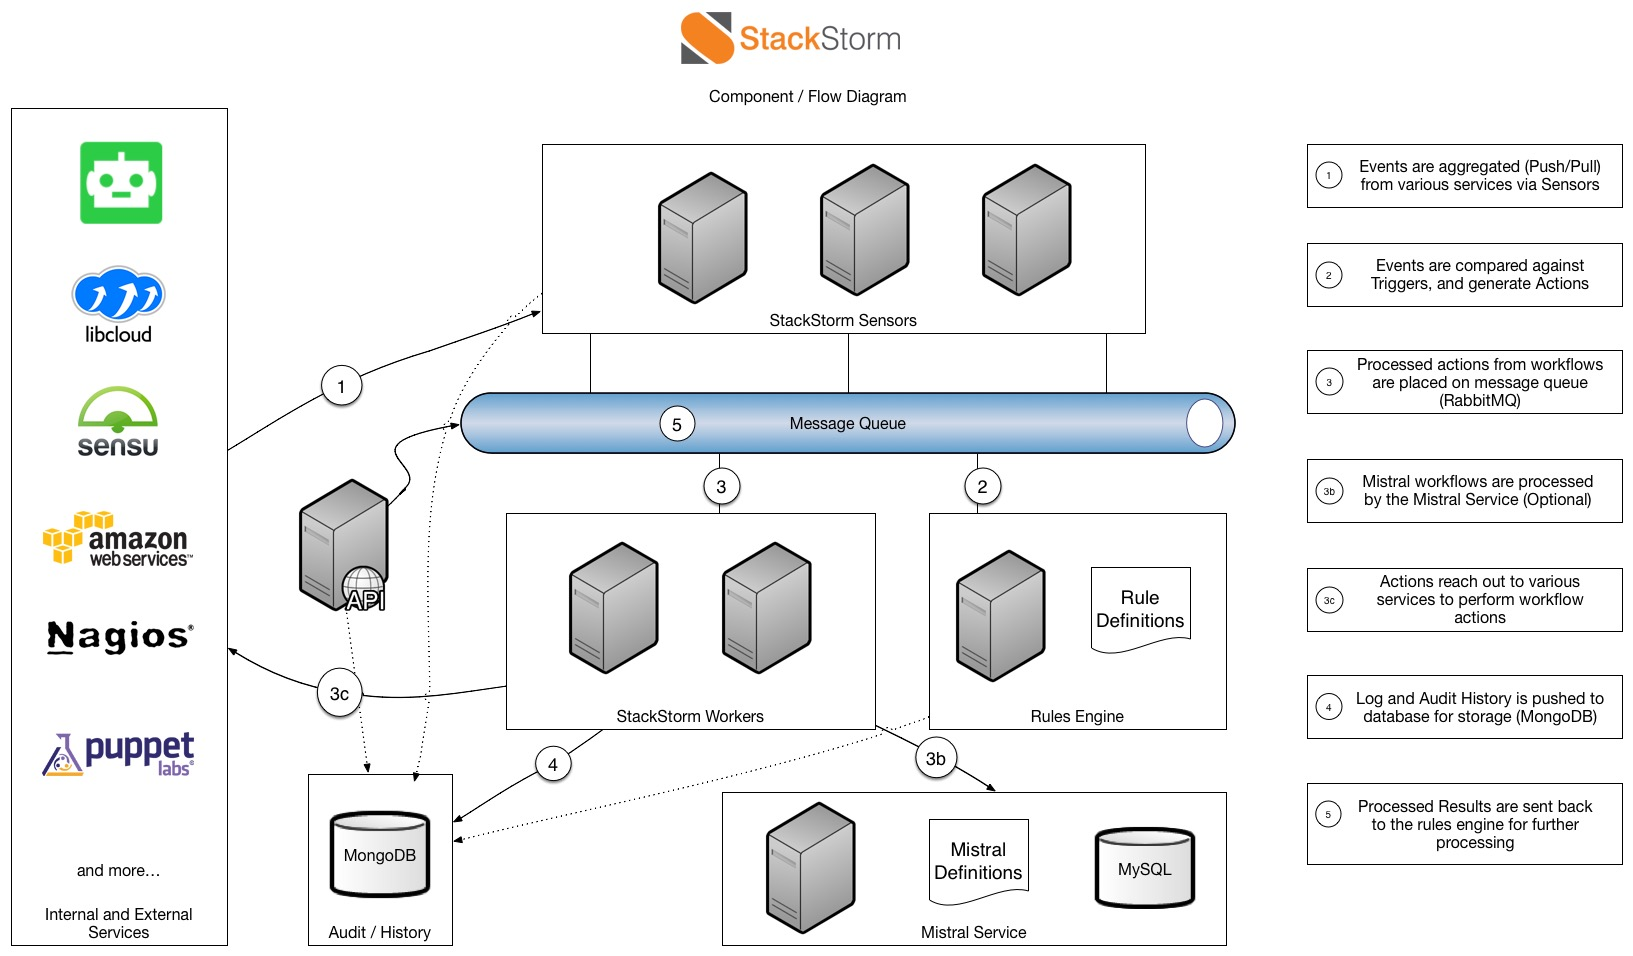 Stackstorm overview stackstorm 281 documentation imagesarchitecturediagramg stackstorm architecture diagram ccuart Choice Image